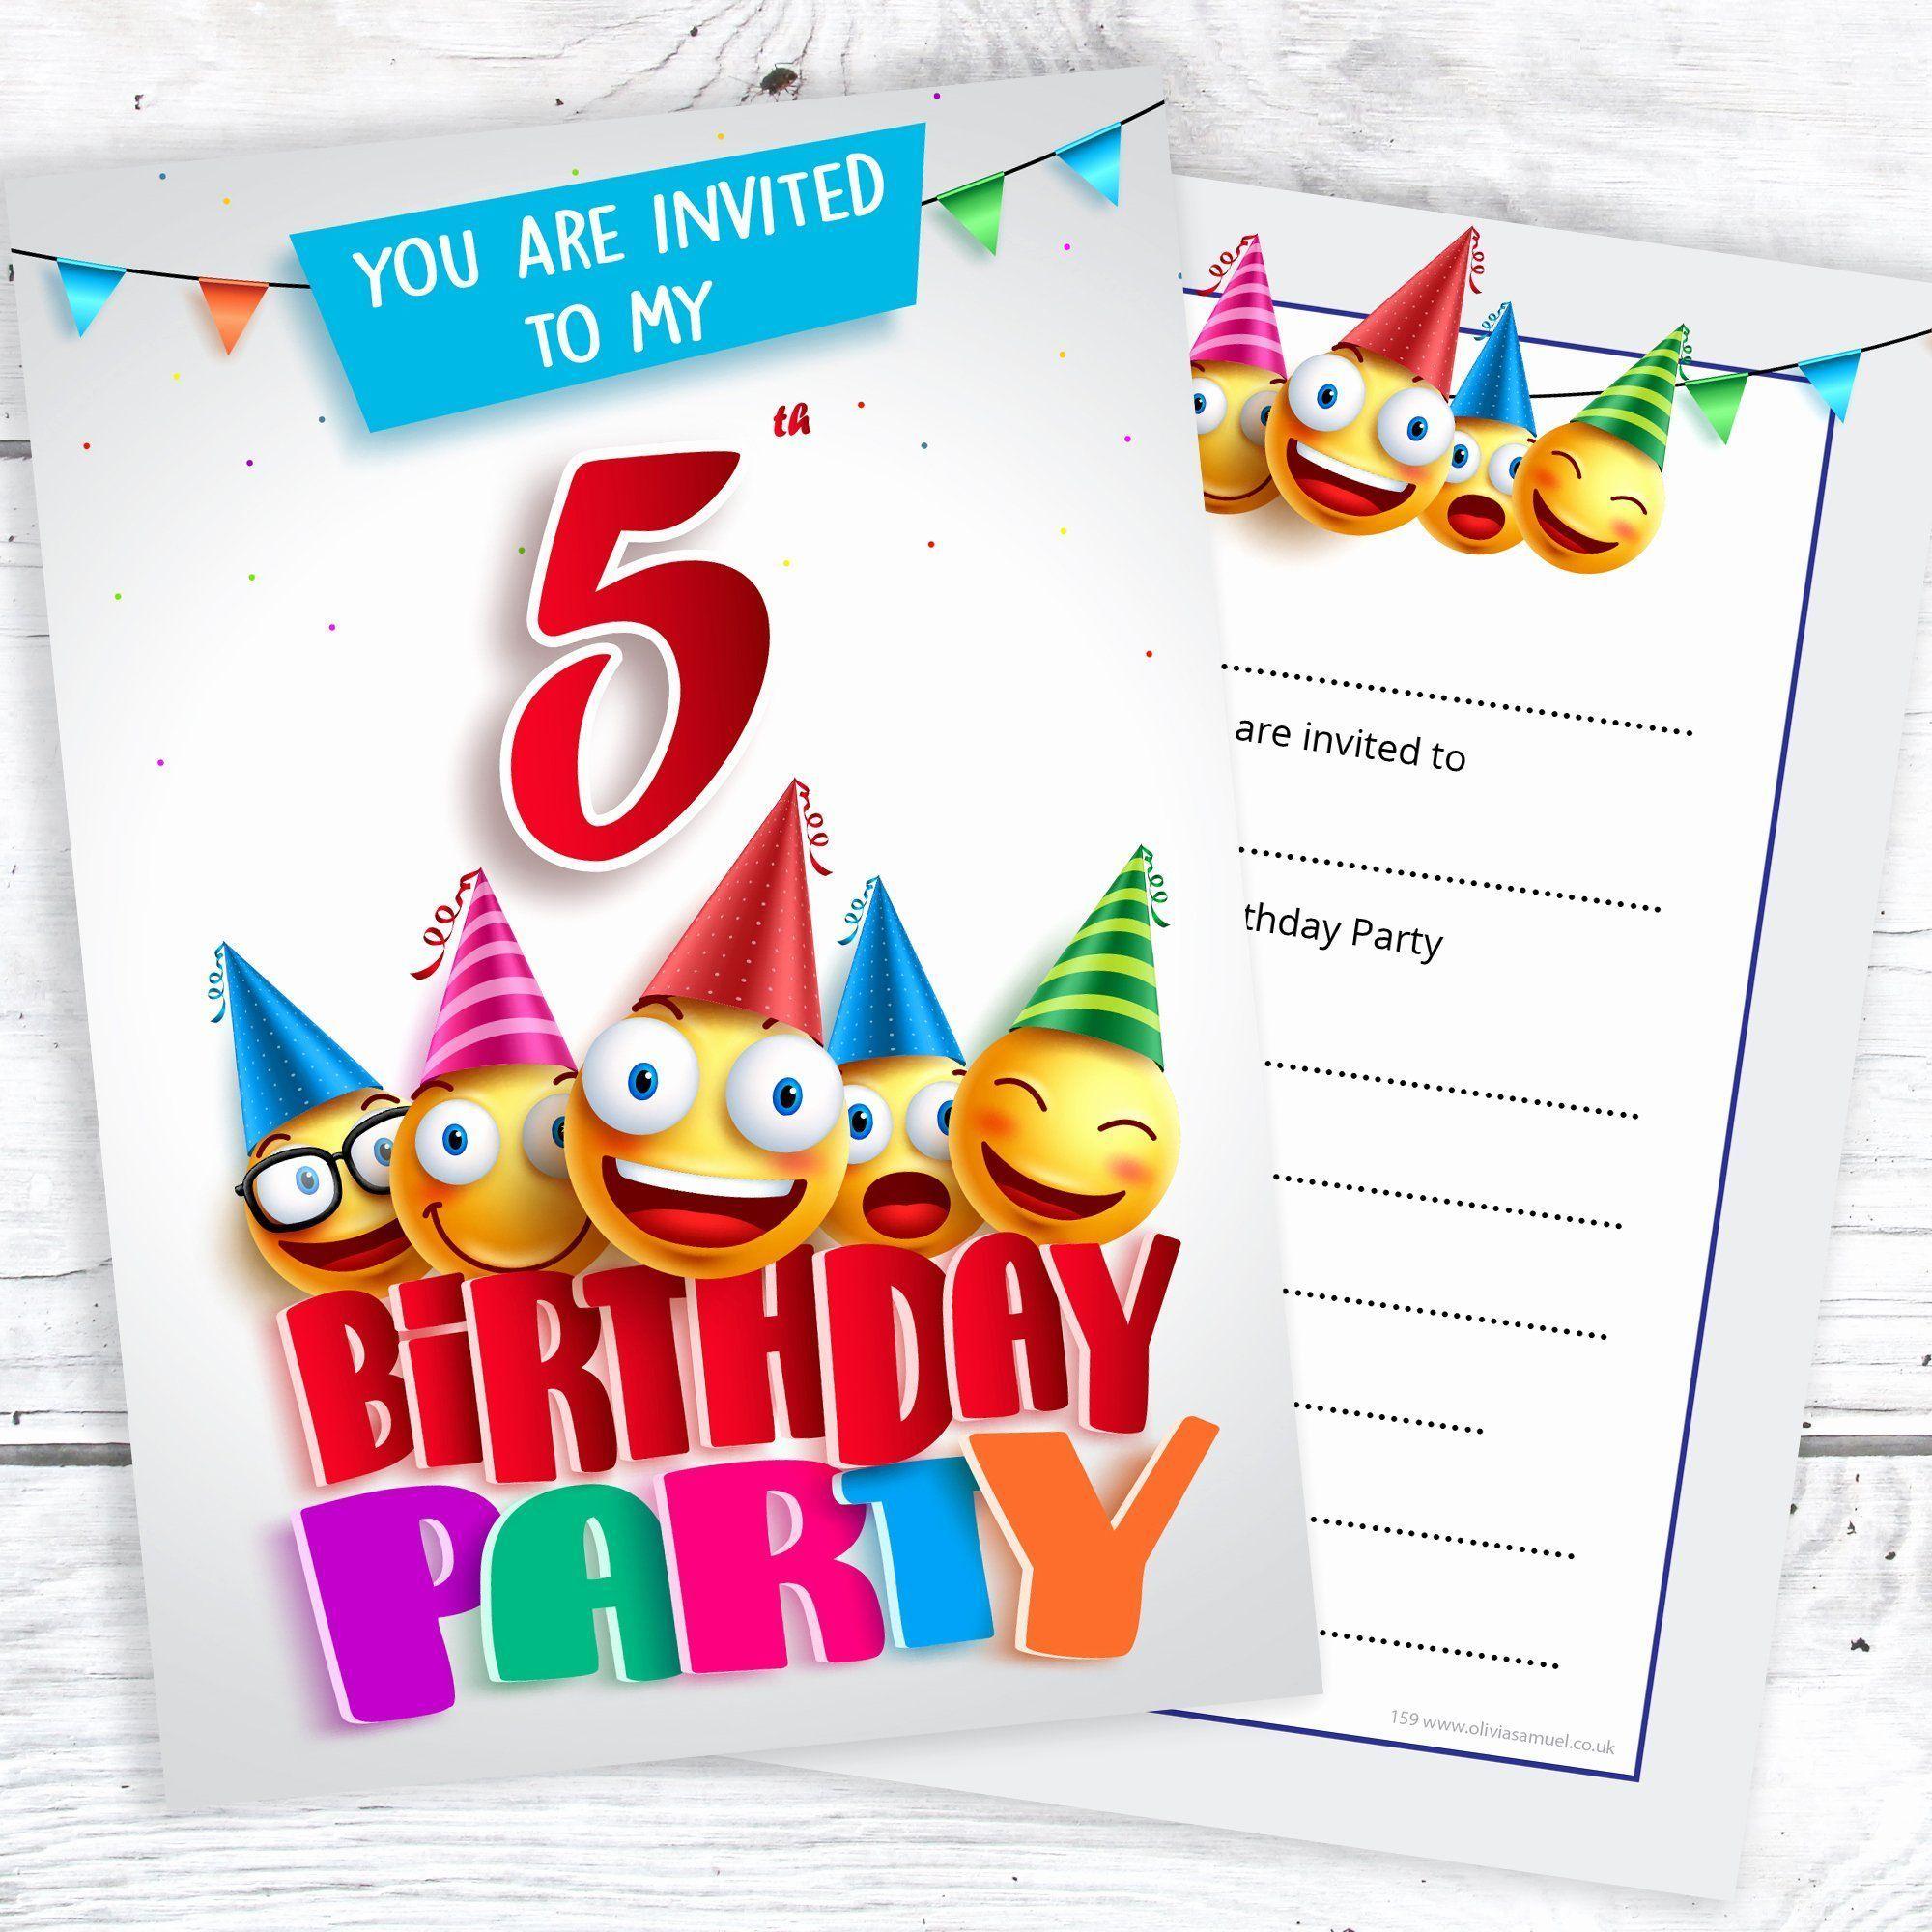 5th Birthday Invitation Wording Inspirational 5th Birthday Party Invites Emo Minion Birthday Invitations Monster Birthday Invitations Emoji Birthday Party